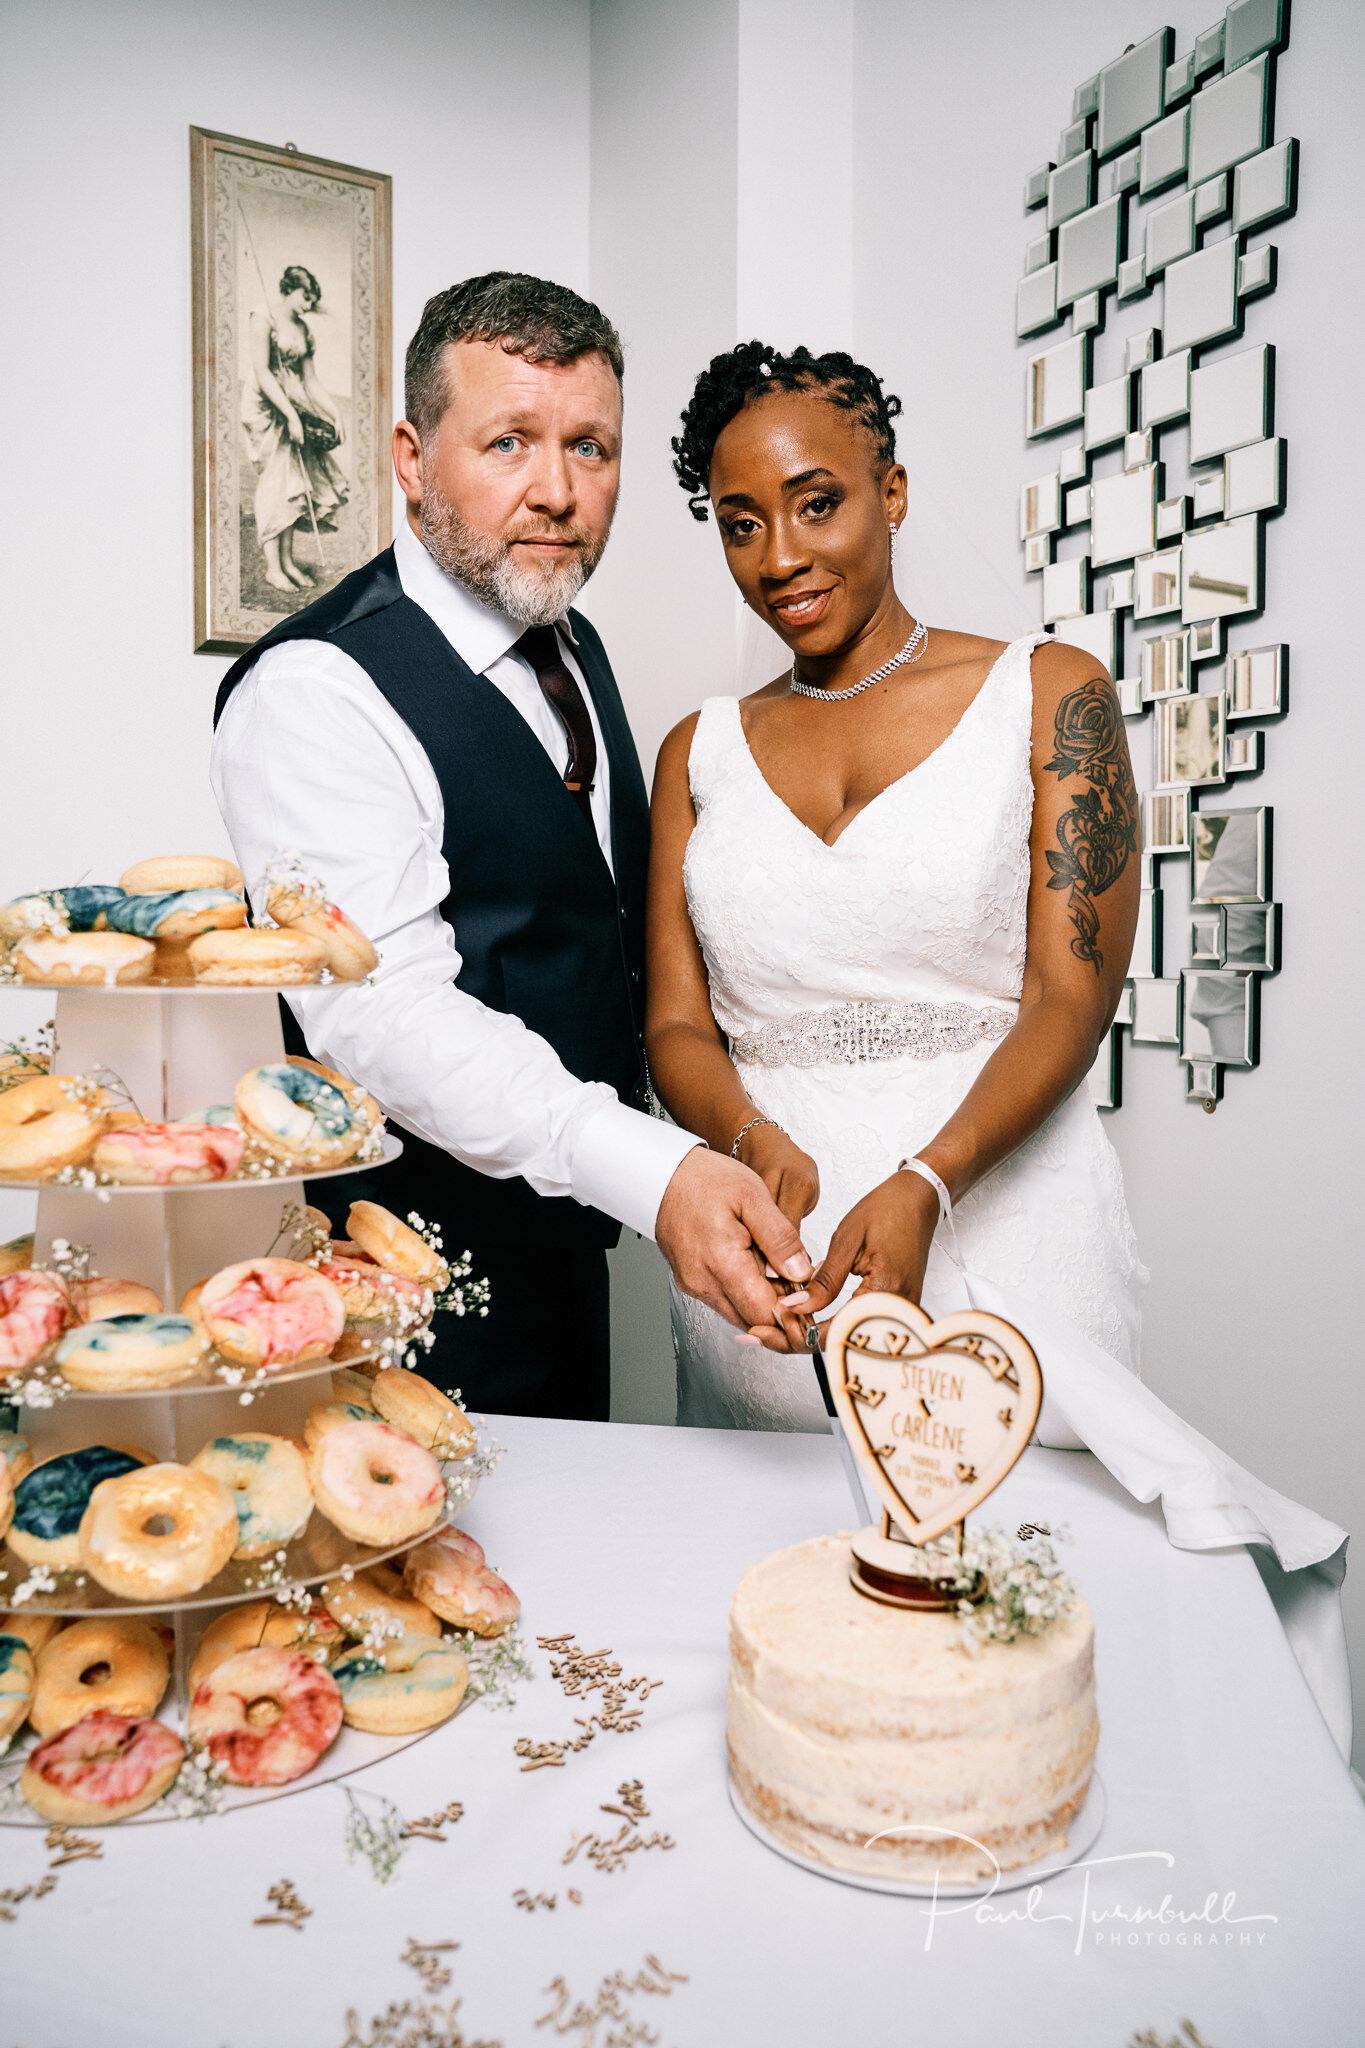 Cutting the wedding cake at Lazaat Hotel. Bride and groom enjoying the gardens of Lazaat Hotel. Wedding photographer Hull